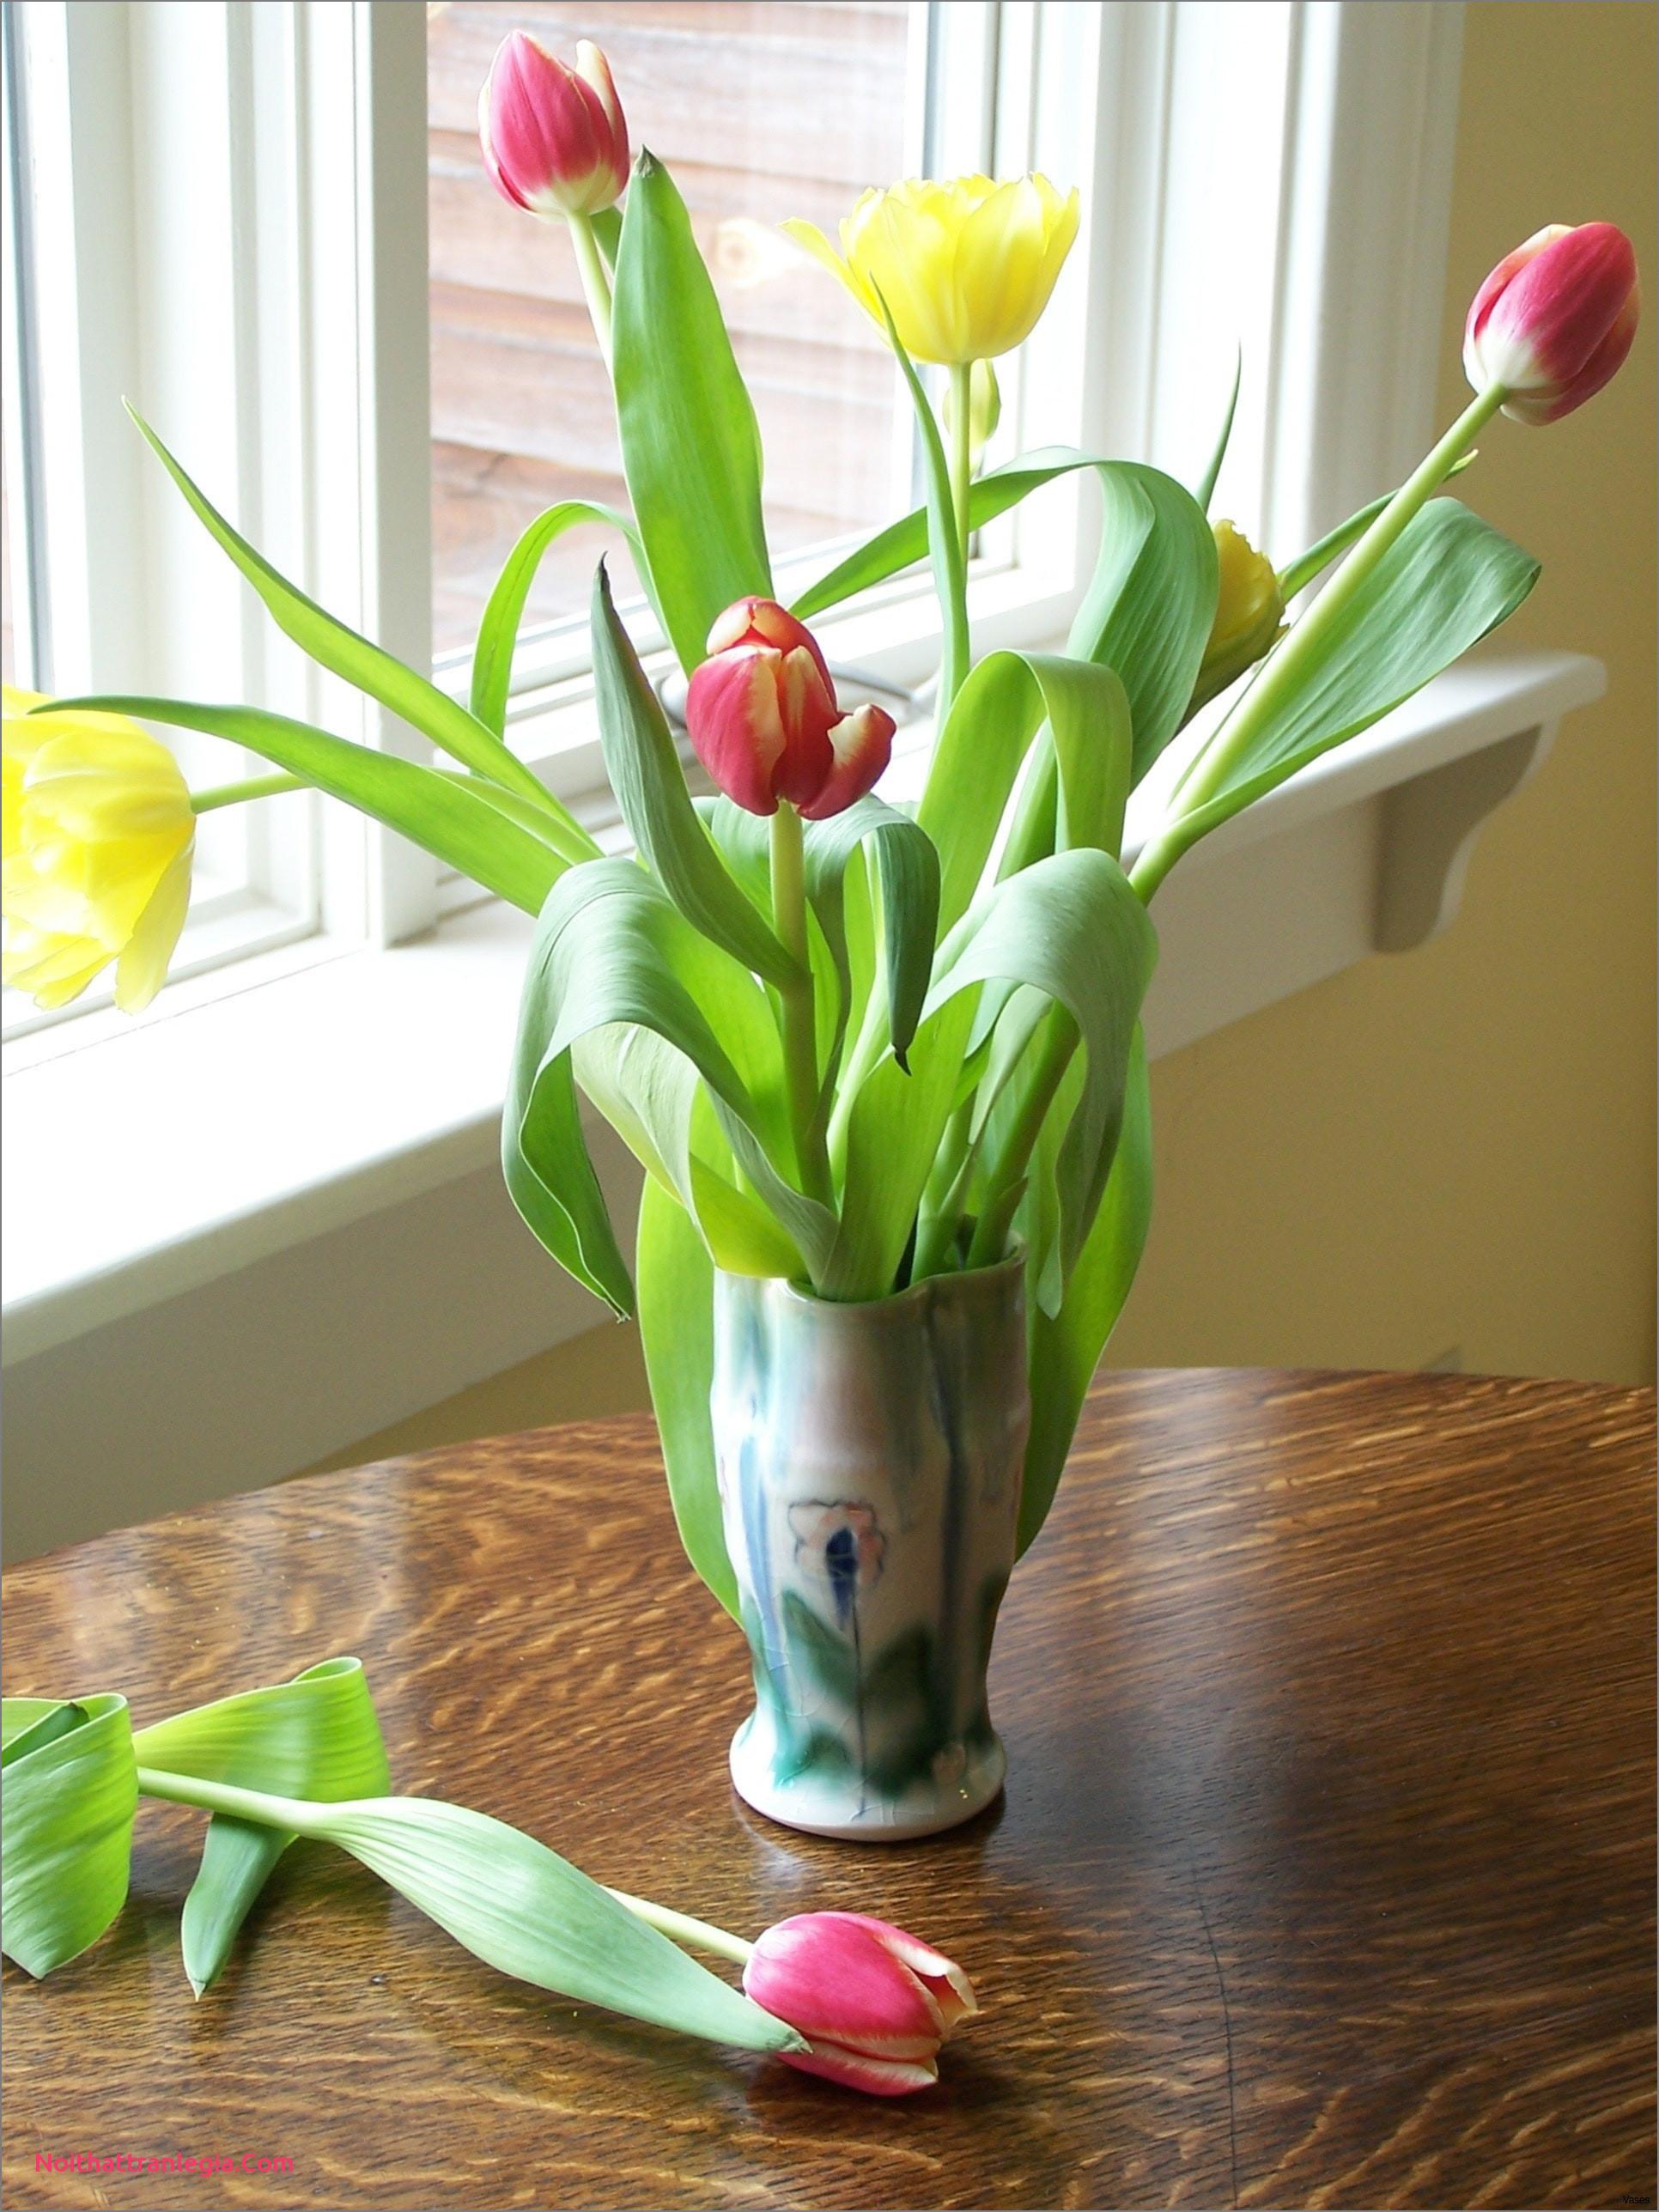 metal vase with handles of 20 how to clean flower vases noithattranlegia vases design with regard to il fullxfull l7e9h vases single flower vase ideas zoomi 0d inspiration single flower vase